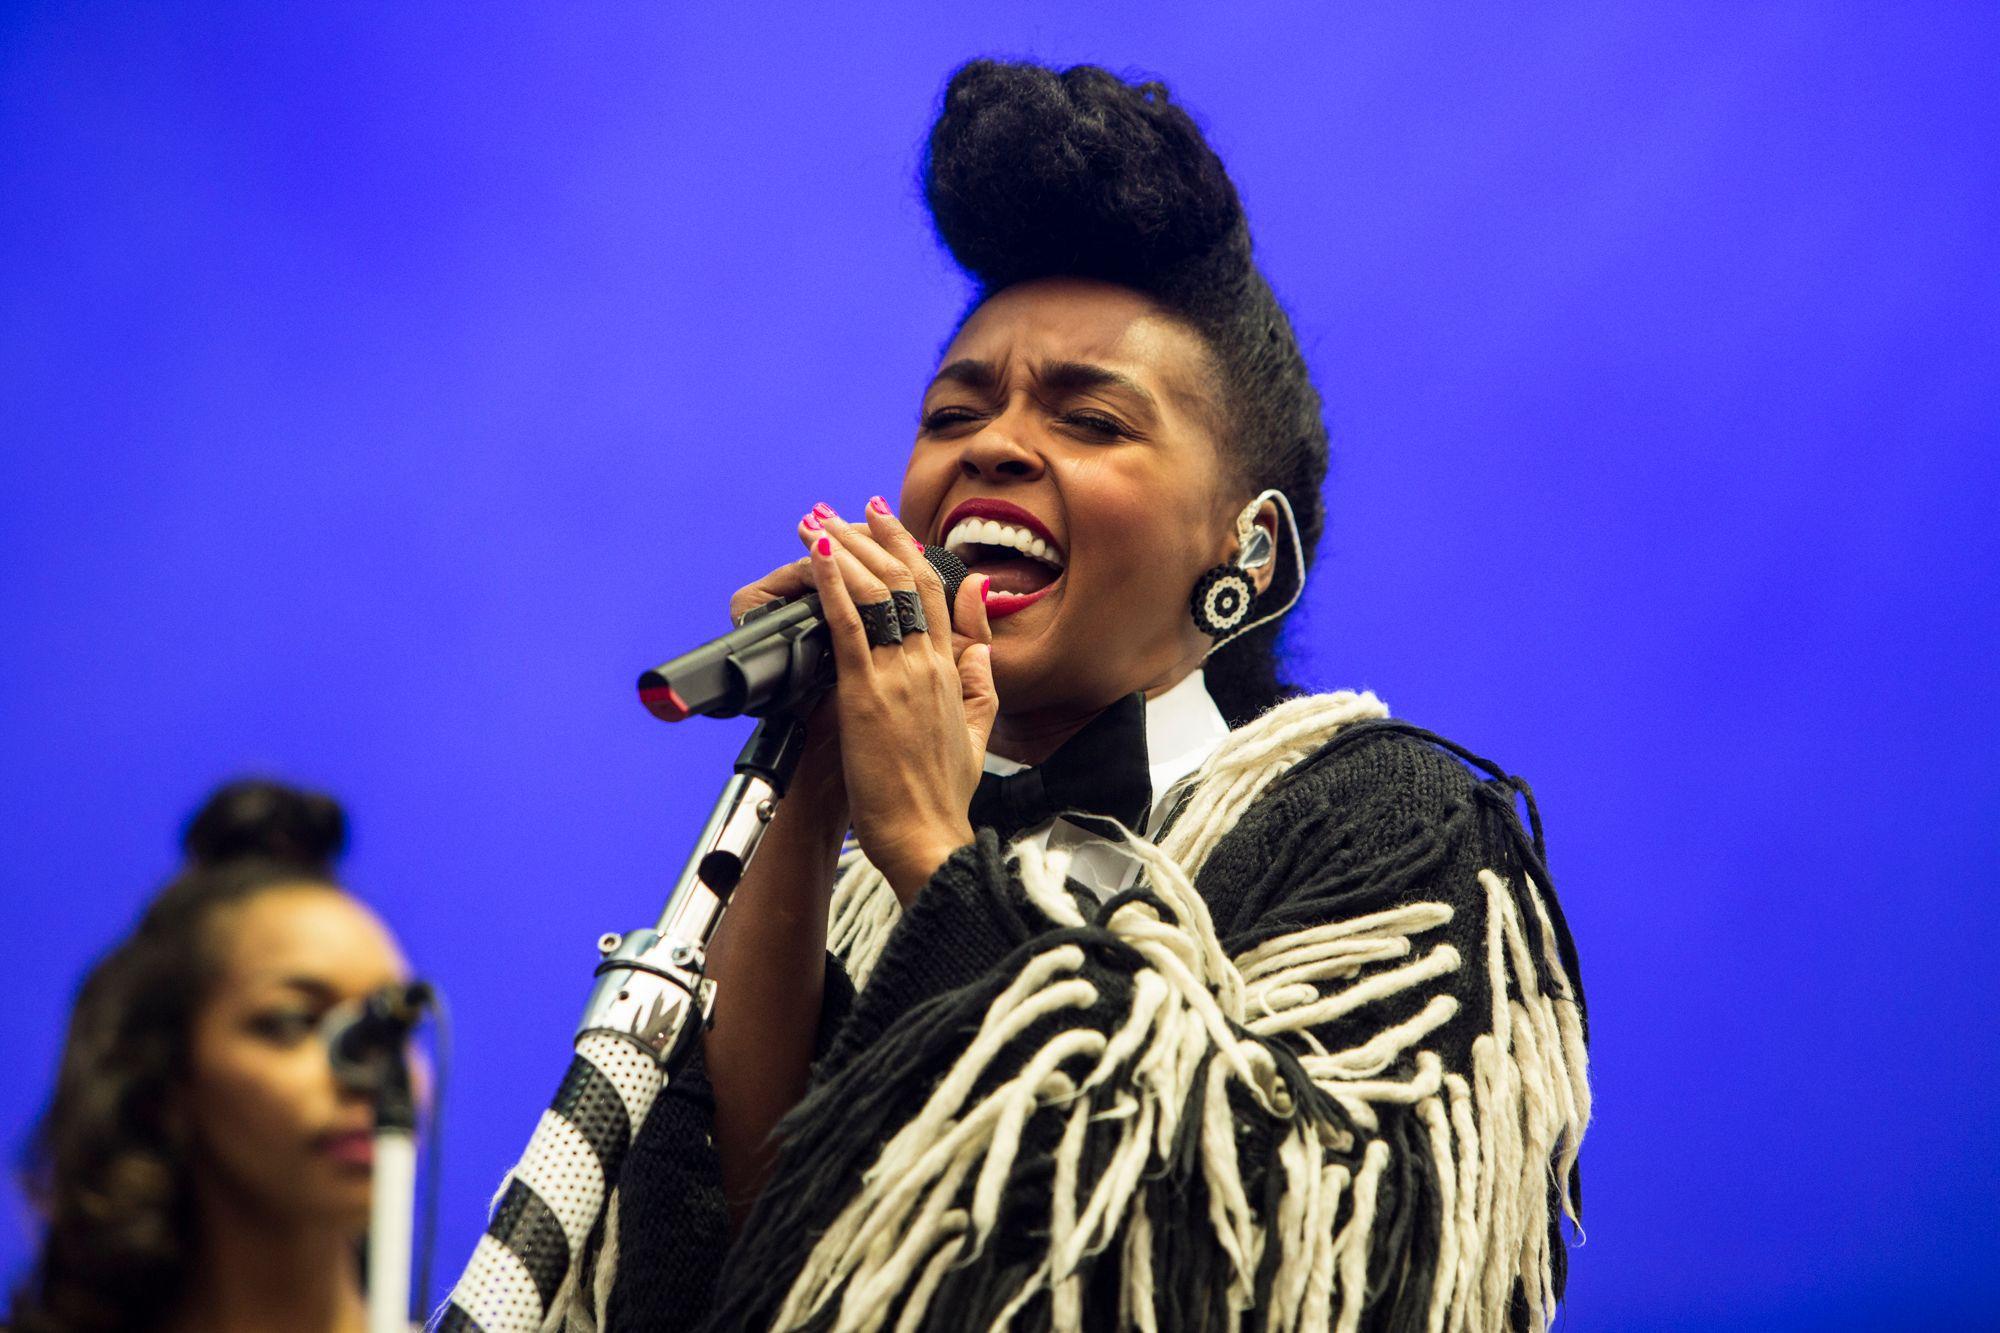 Janelle Monae in concert